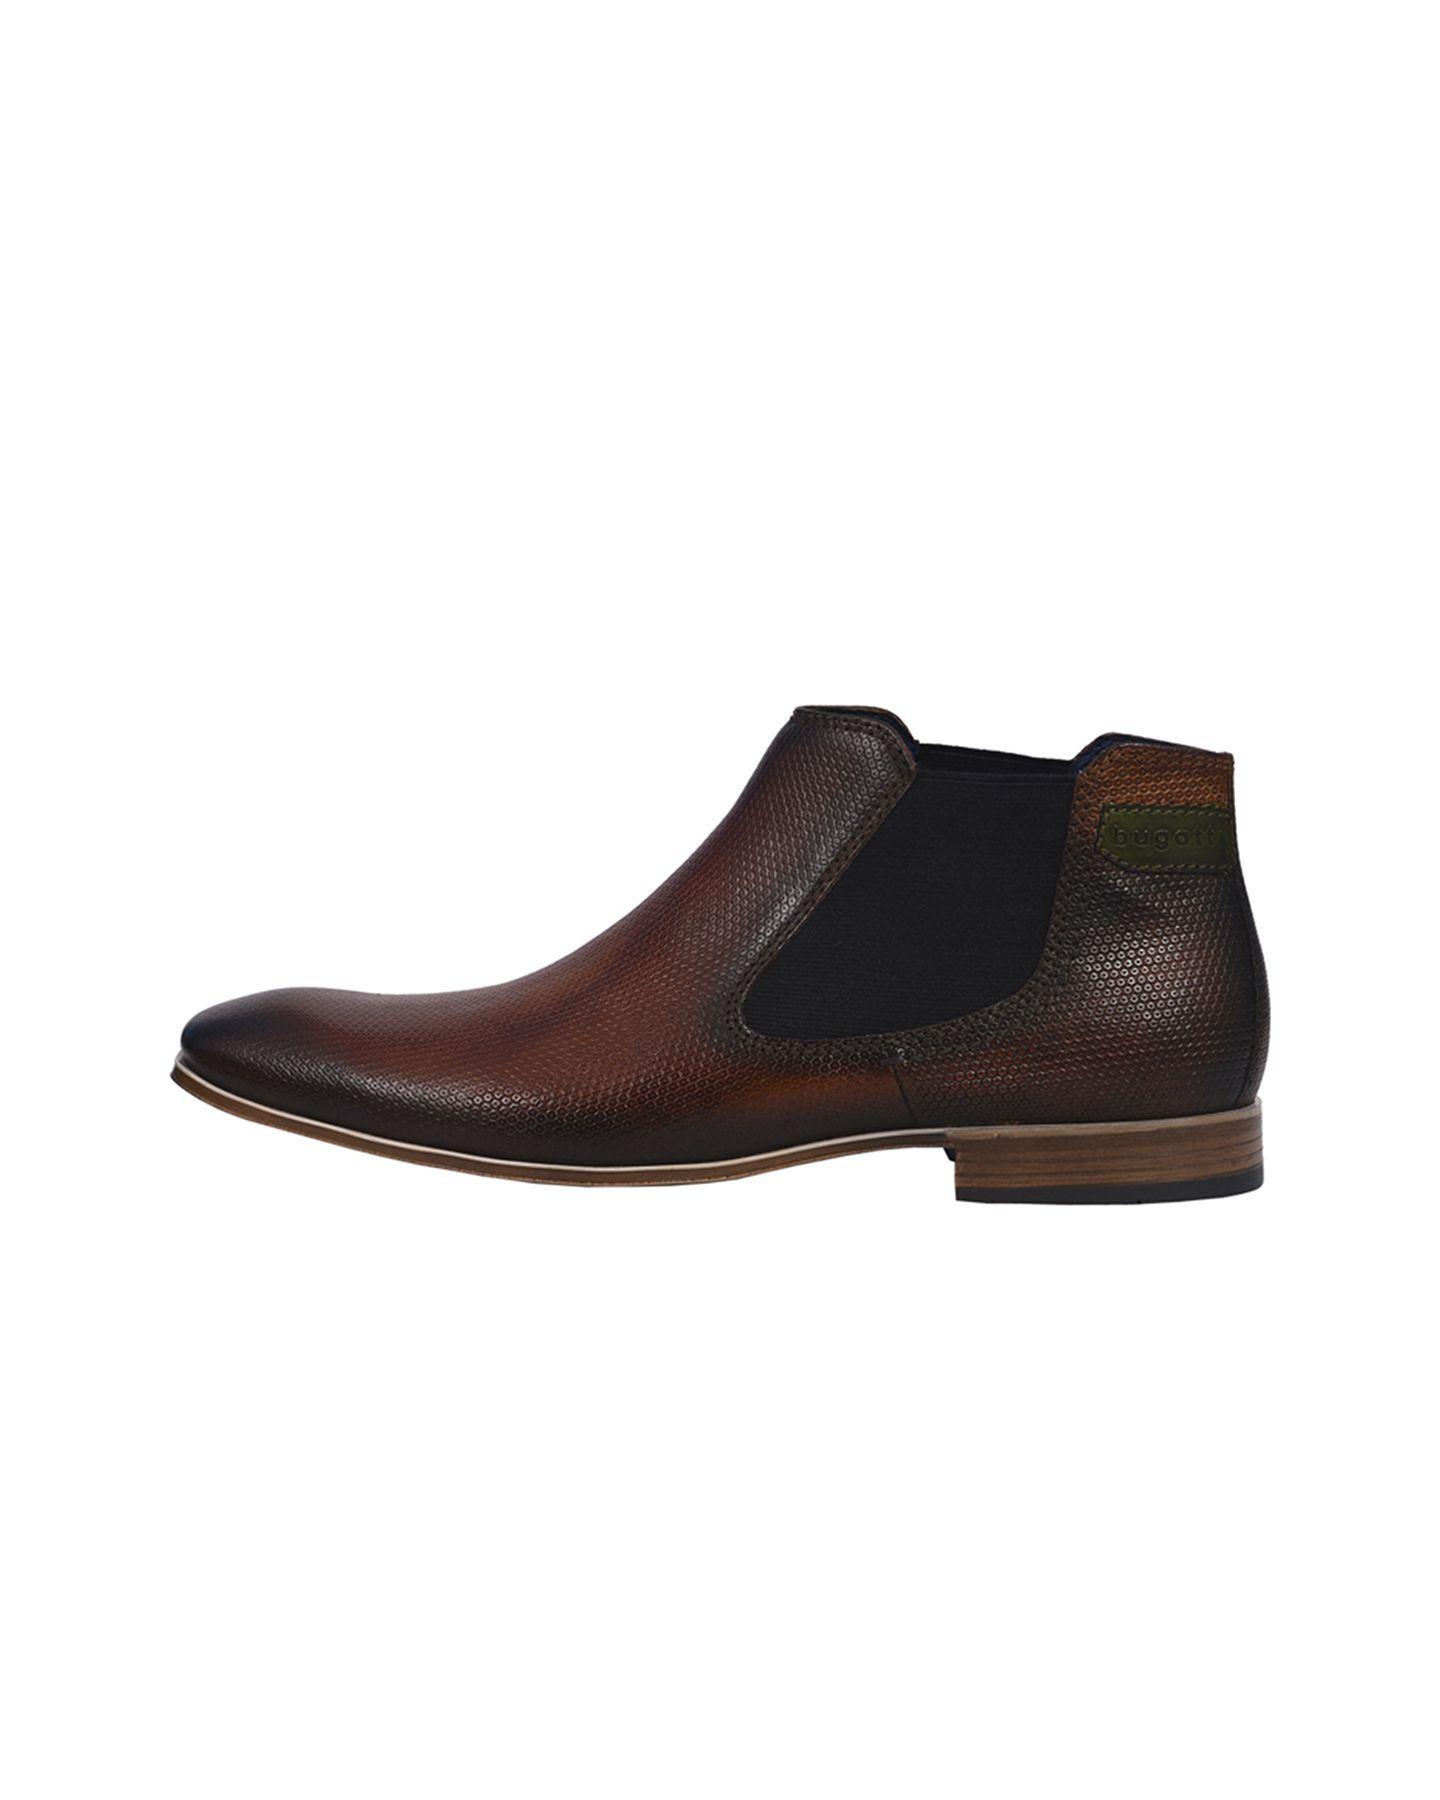 bugatti Chelsea boots in cognac in Größe 40